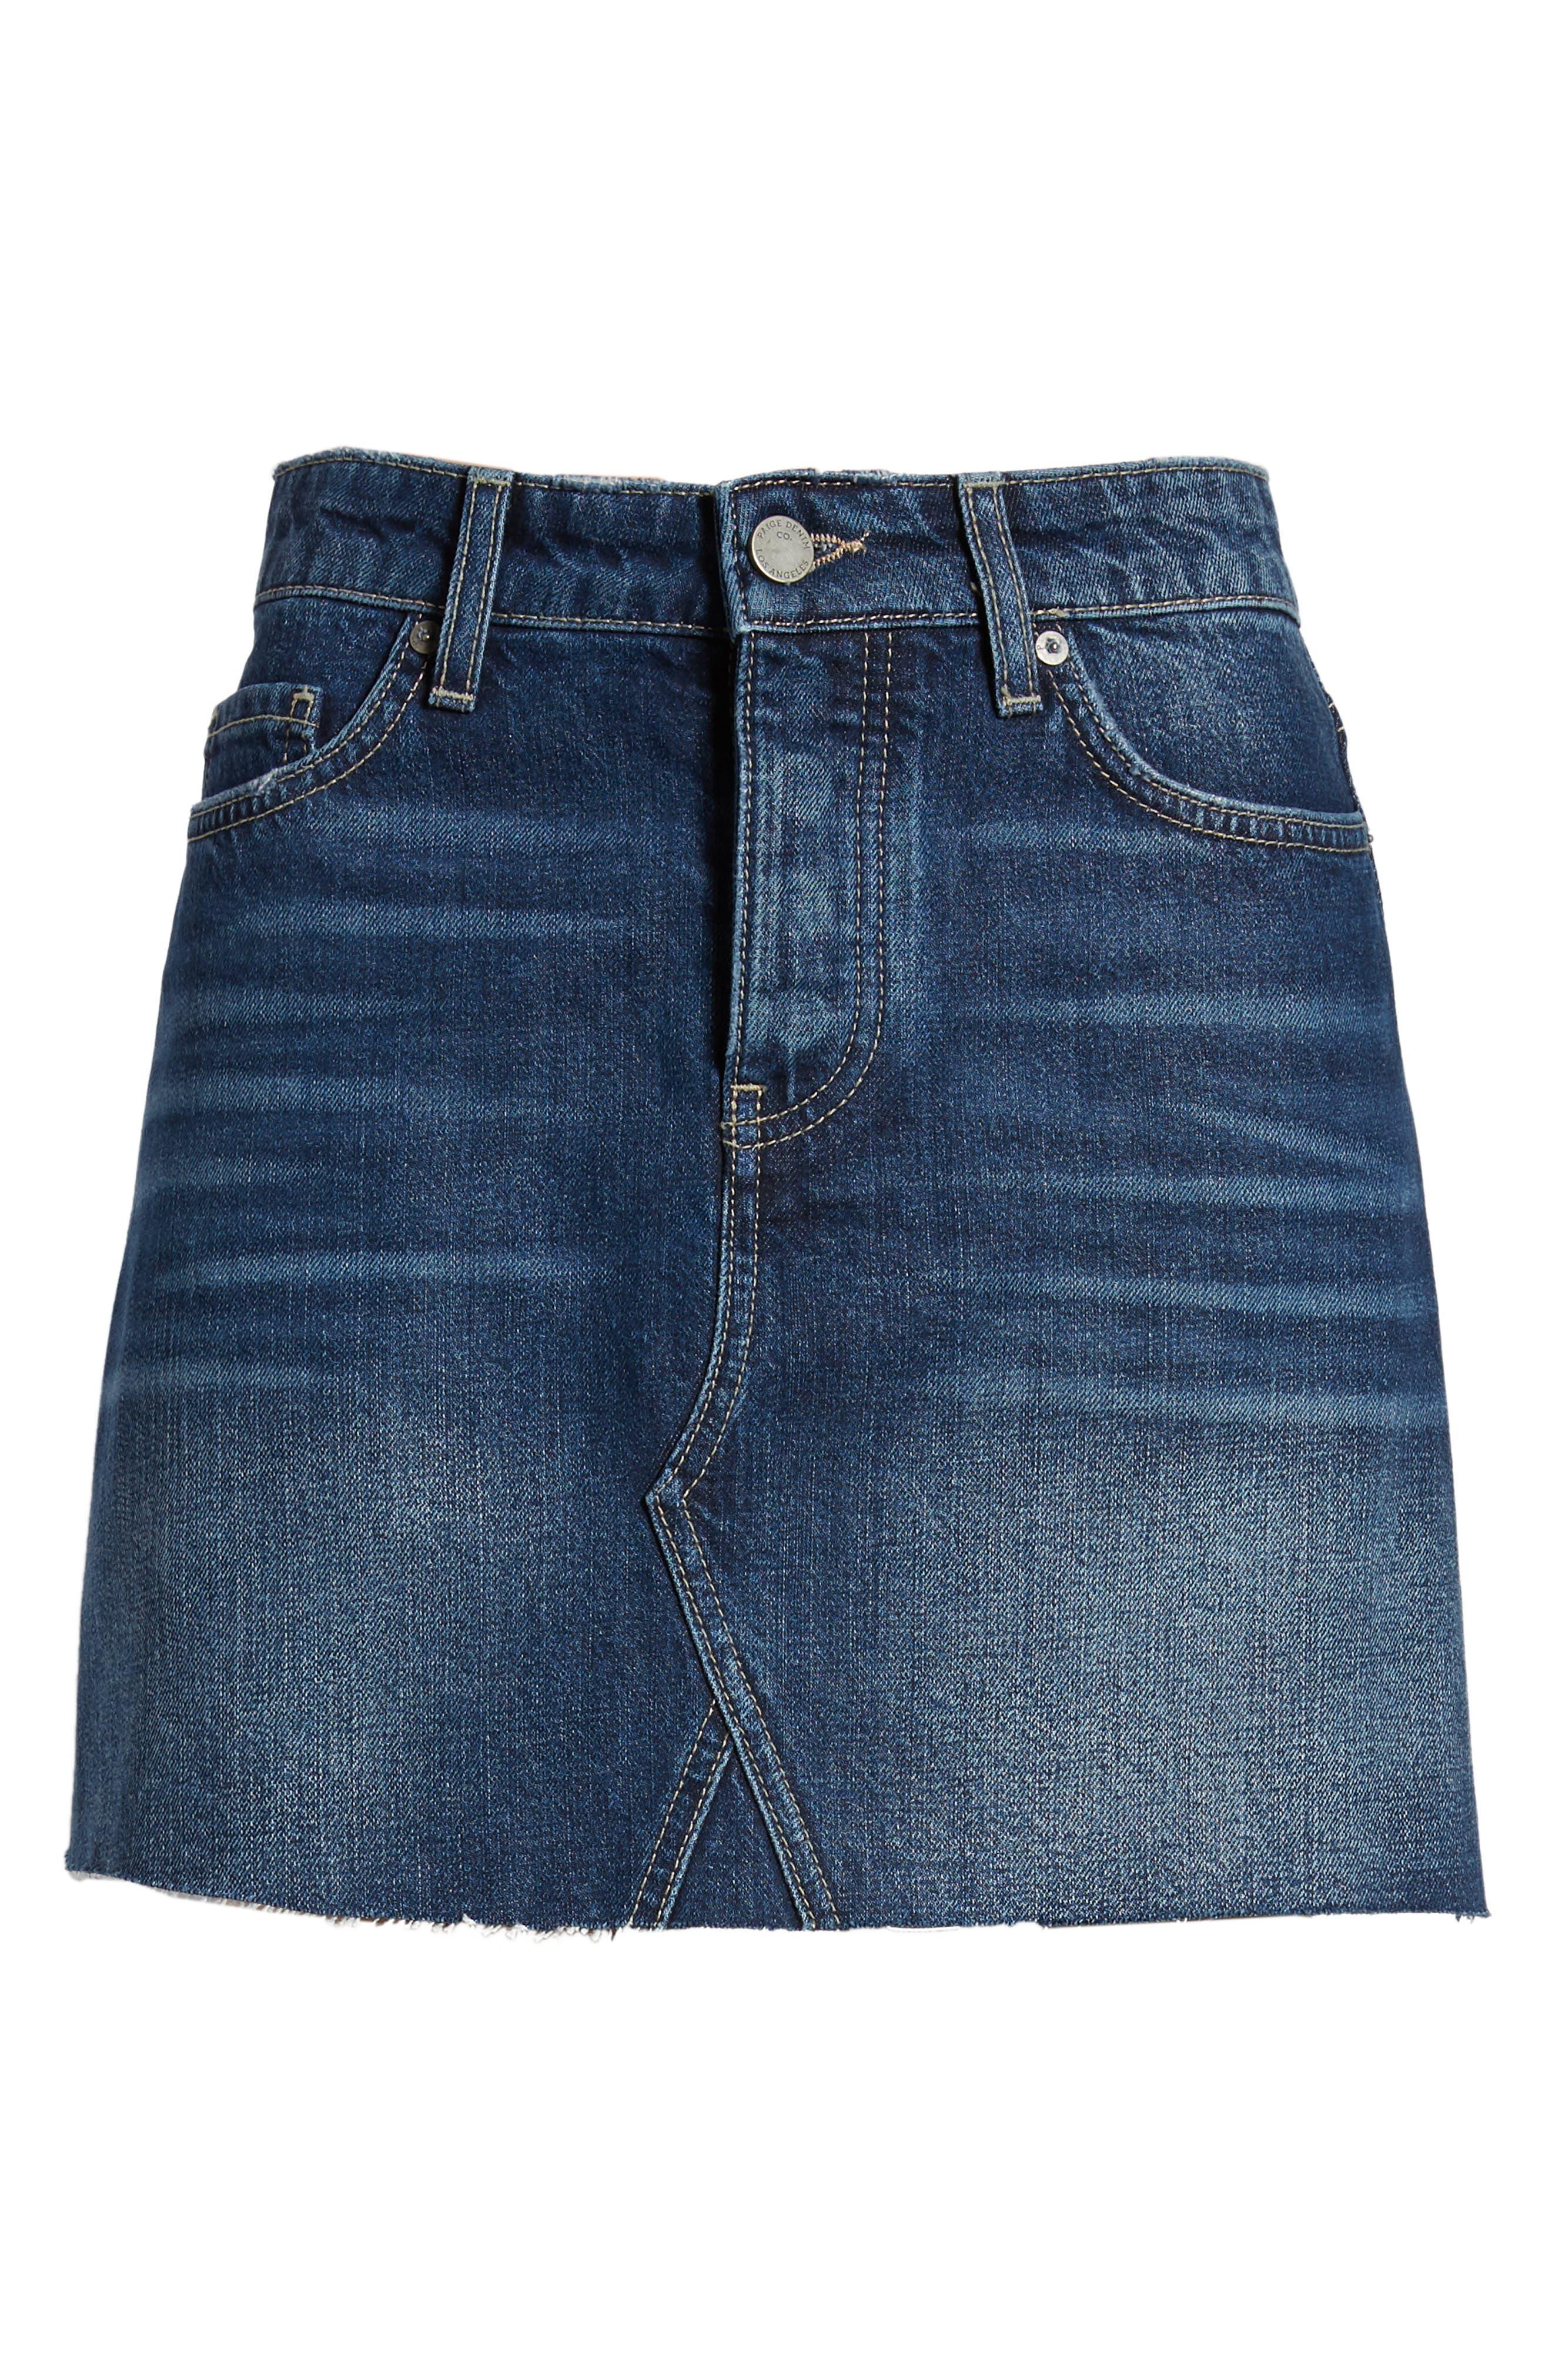 Aideen Denim Miniskirt,                             Alternate thumbnail 6, color,                             400